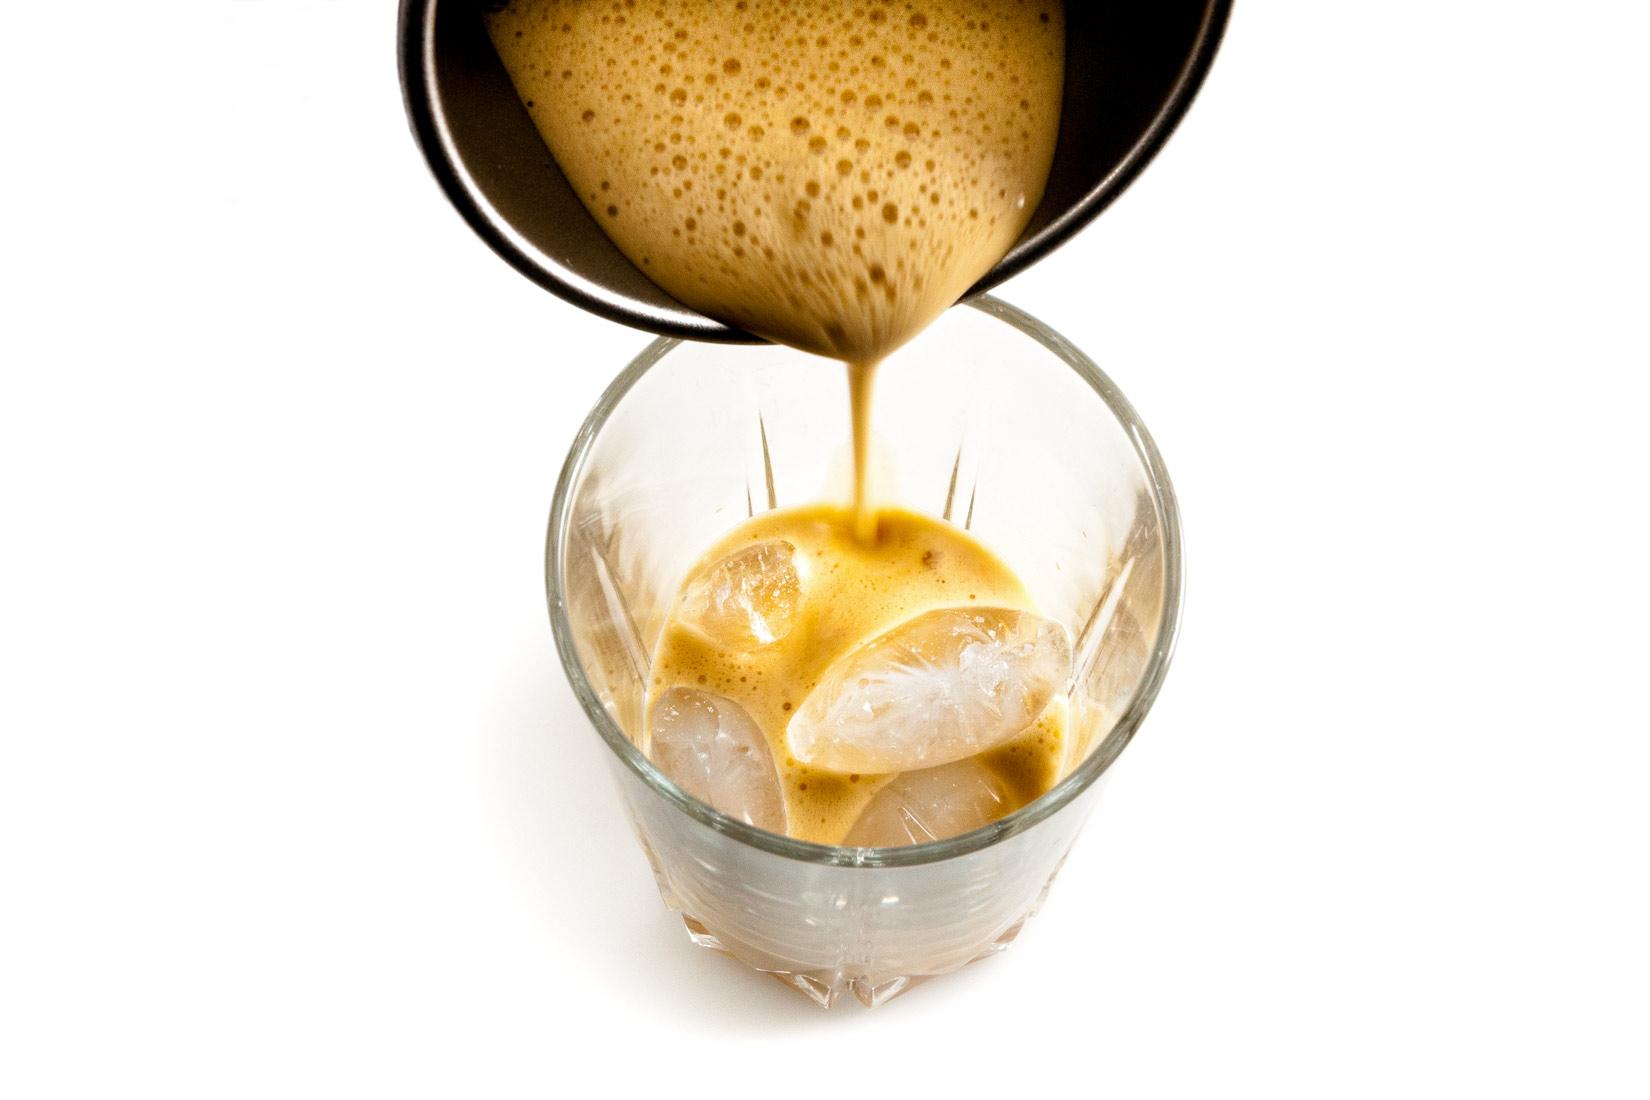 Espresso umixované s kostkami ledu vytvoří bohatou pěnu